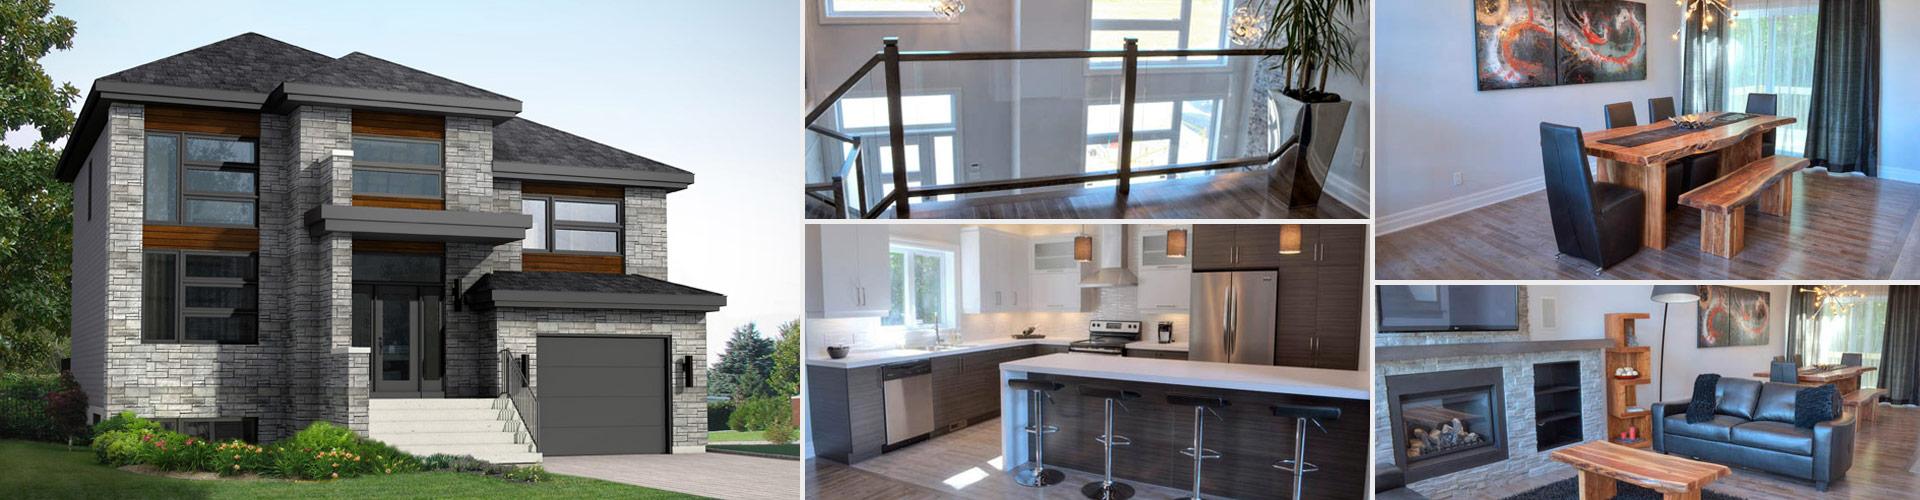 maison moderne a vendre montreal